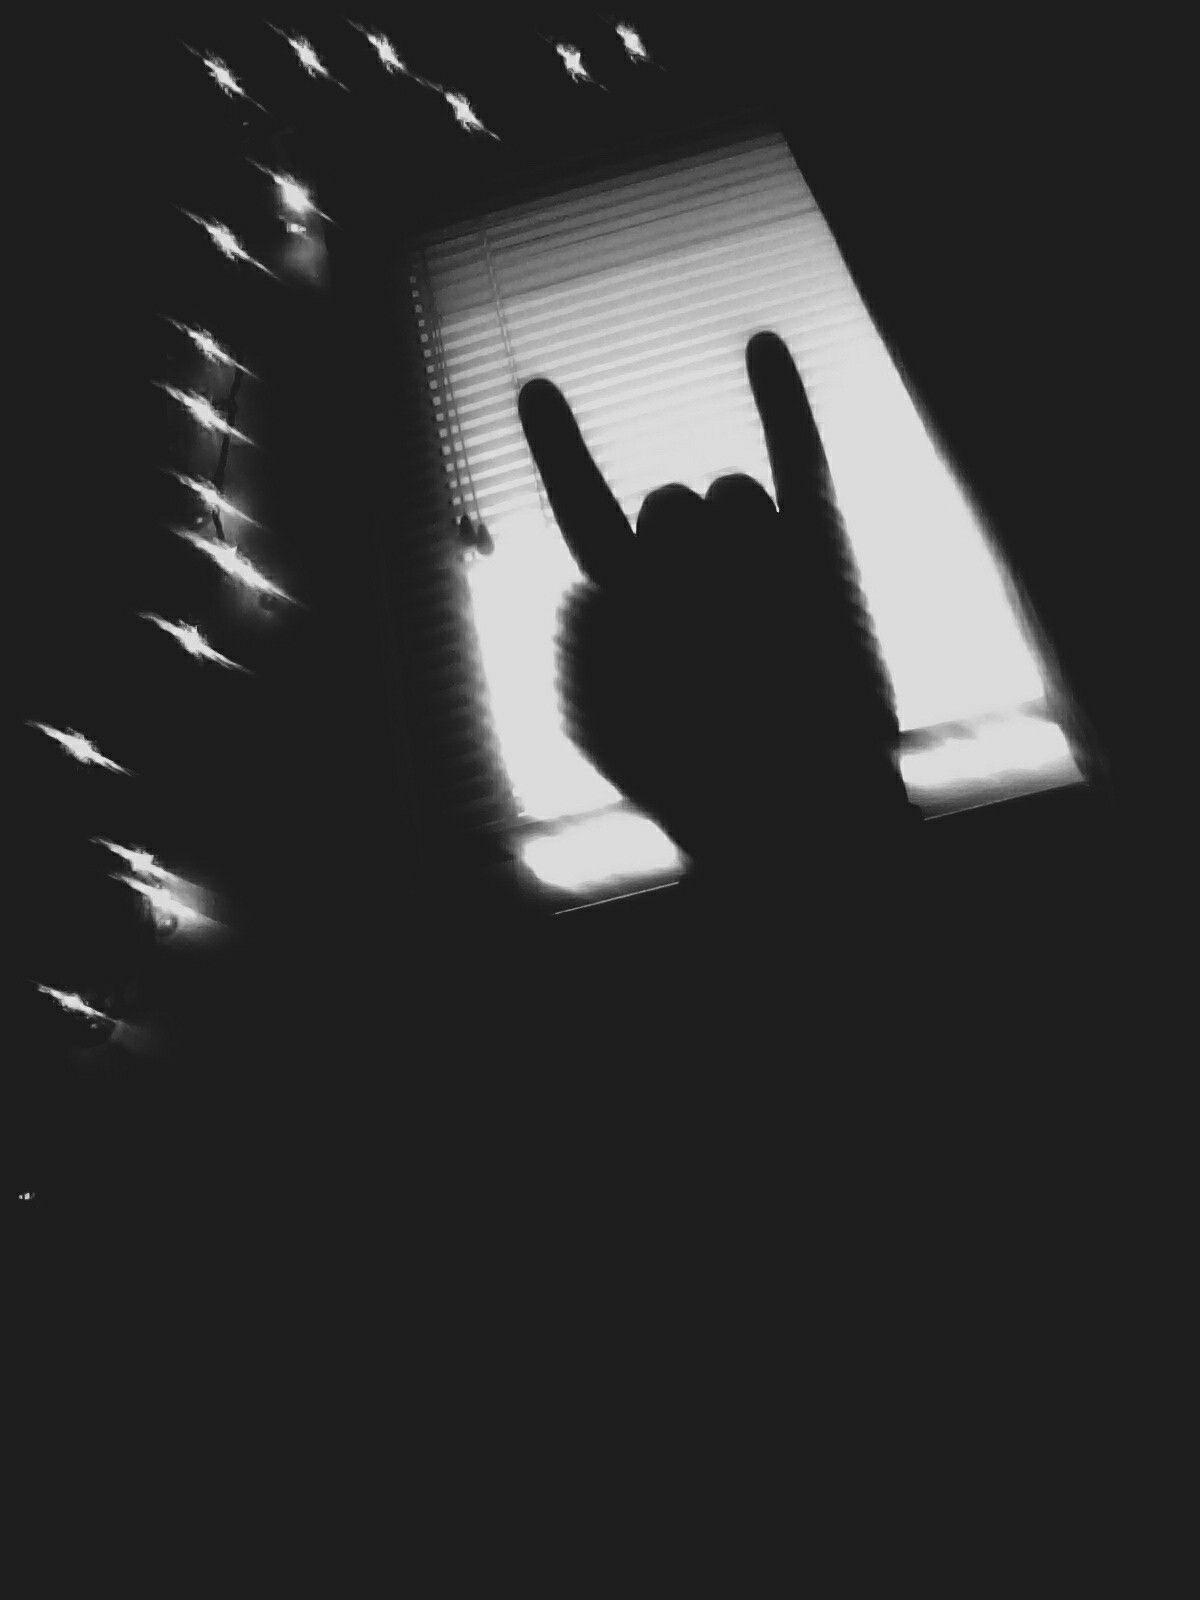 Grunge rock photography